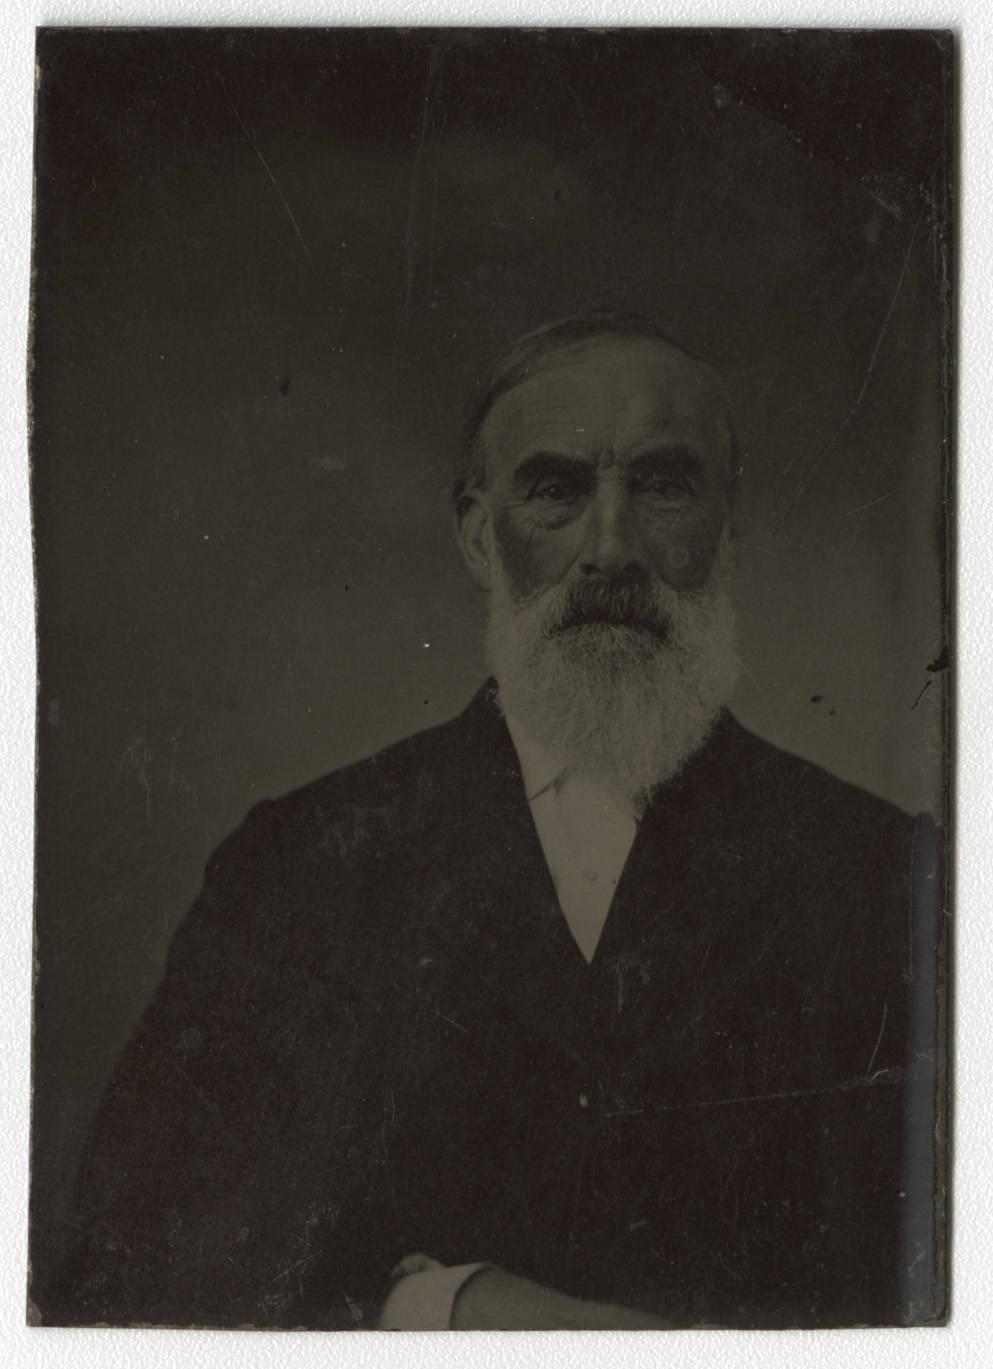 Alexander Latimer, ca. 1865